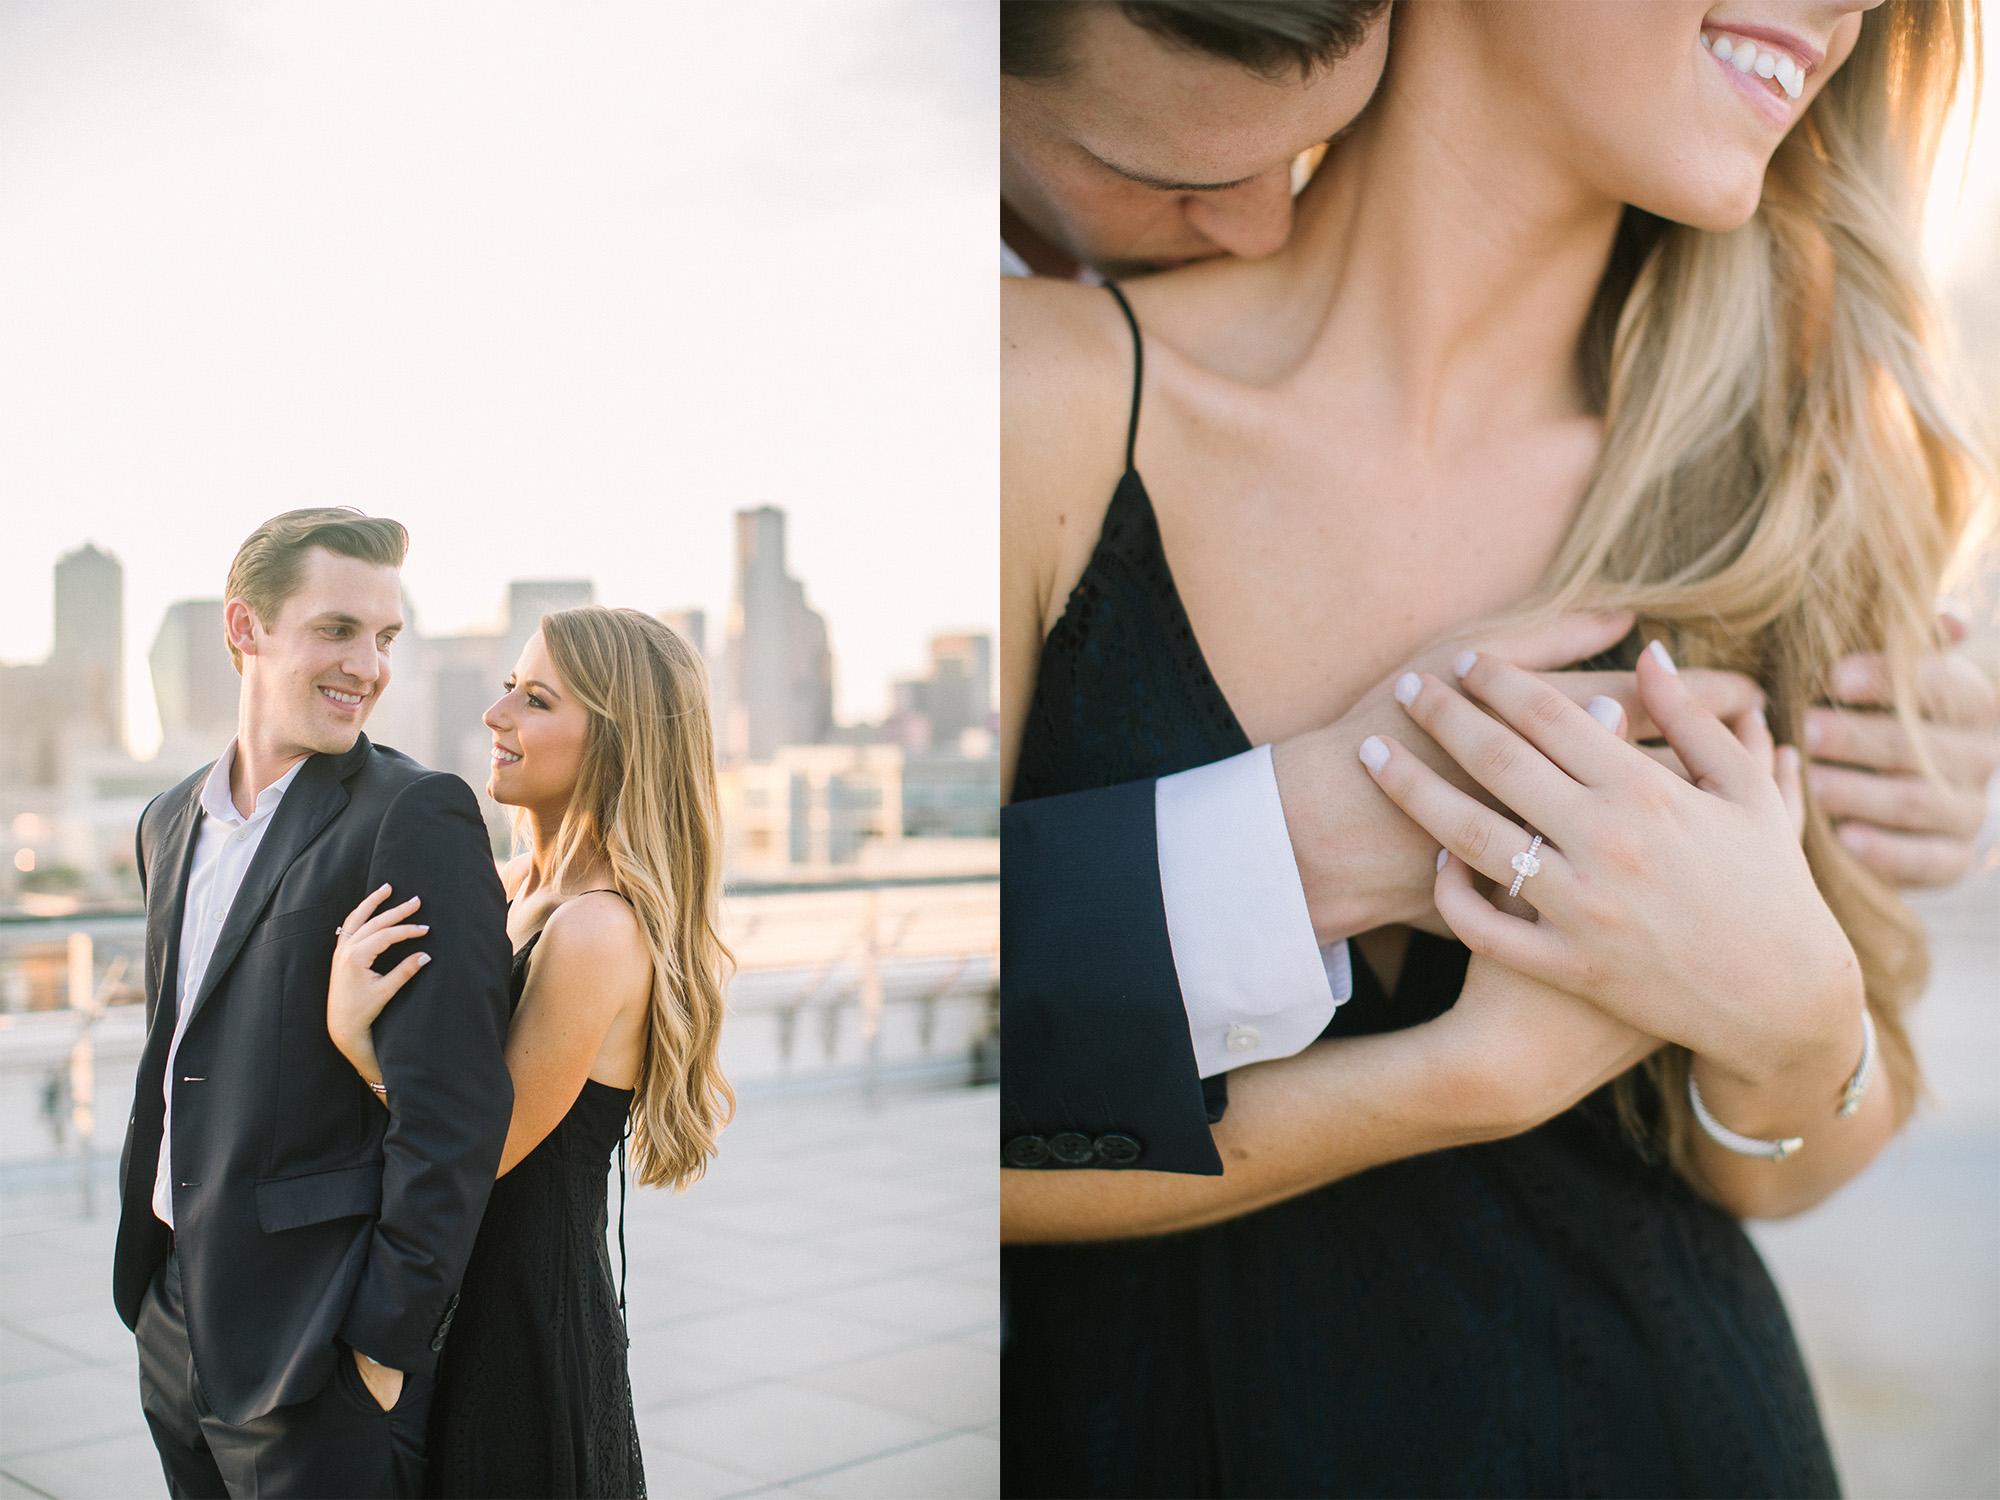 Ellen-Ashton-Photography-Dallas-Wedding-Photographers-Shannon-Rose-Events-Room-on-Main-Dallas-Wedding-Planners-Destination-Wedding-Photographers-21.jpg